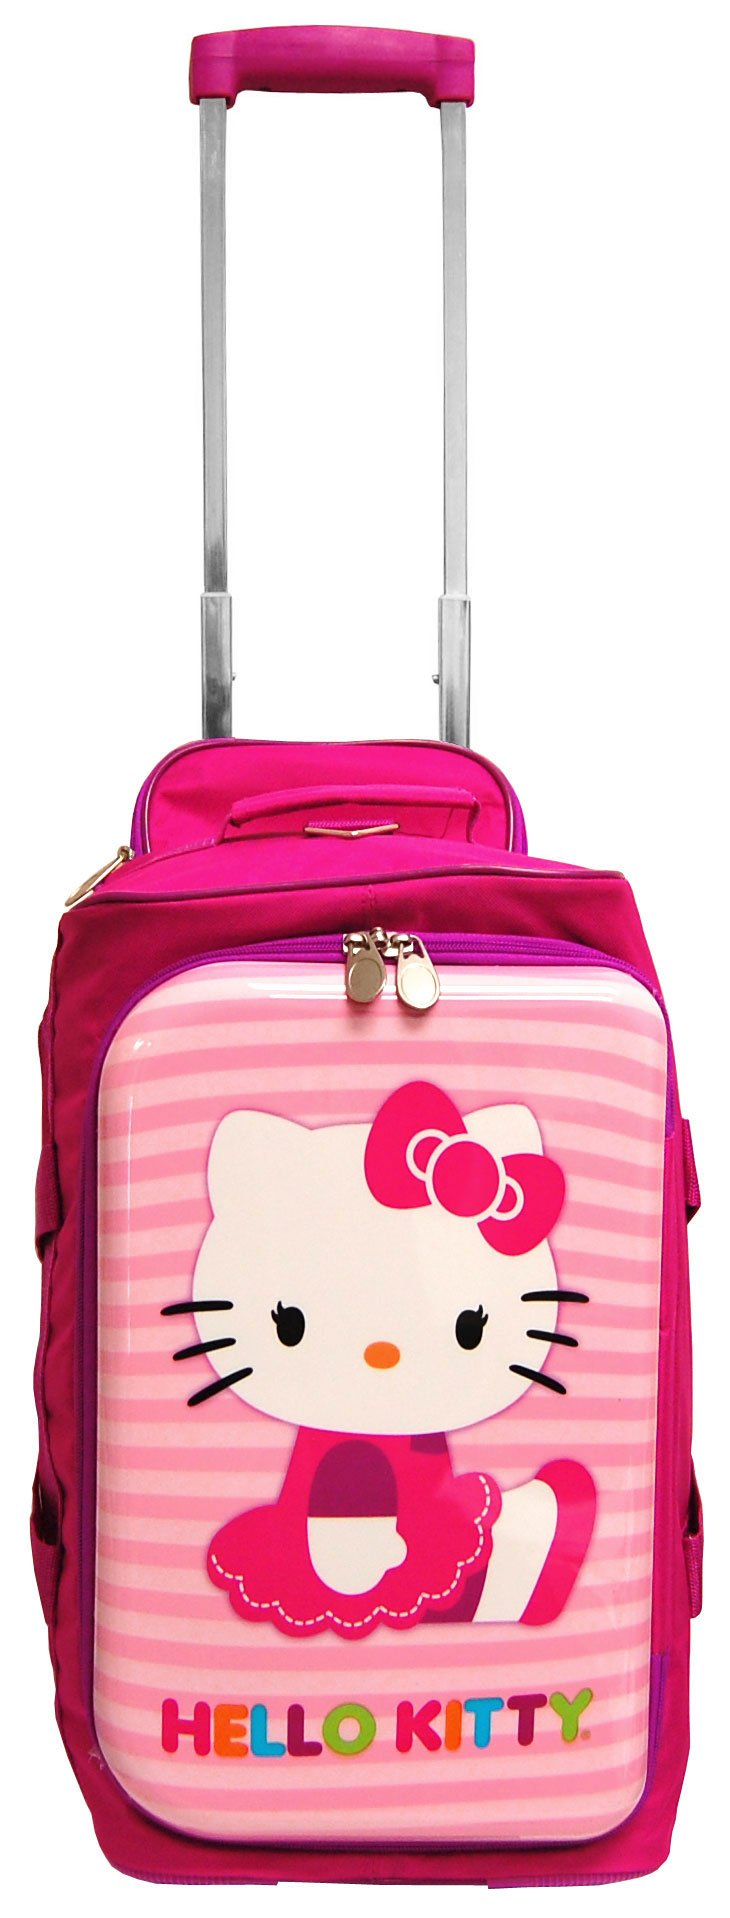 "18"" Sanrio Hello Kitty Rolling Luggage Duffle Bag"